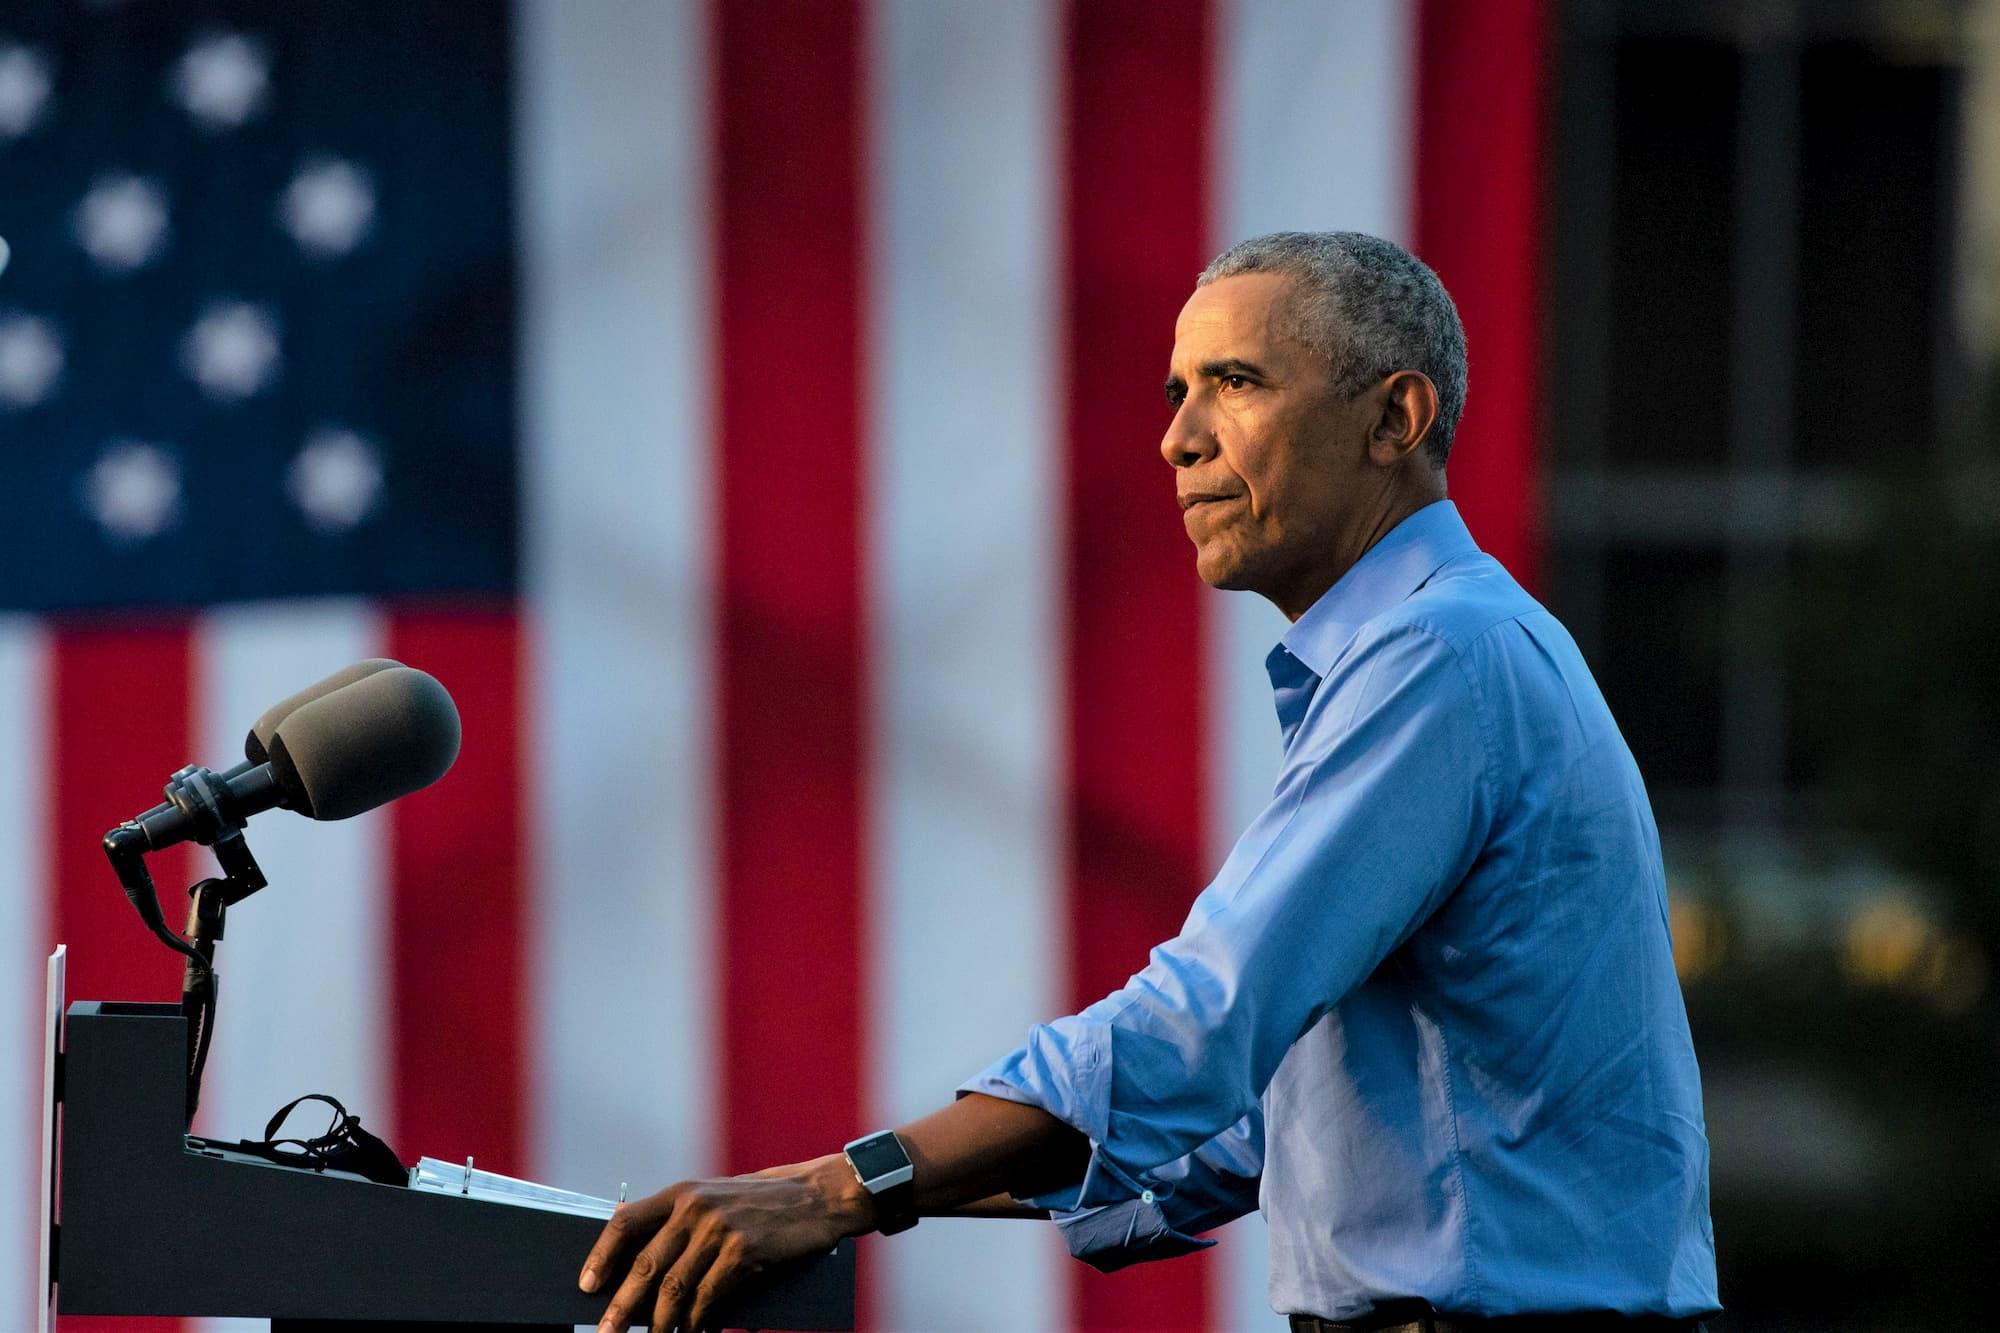 Barack Obama, president